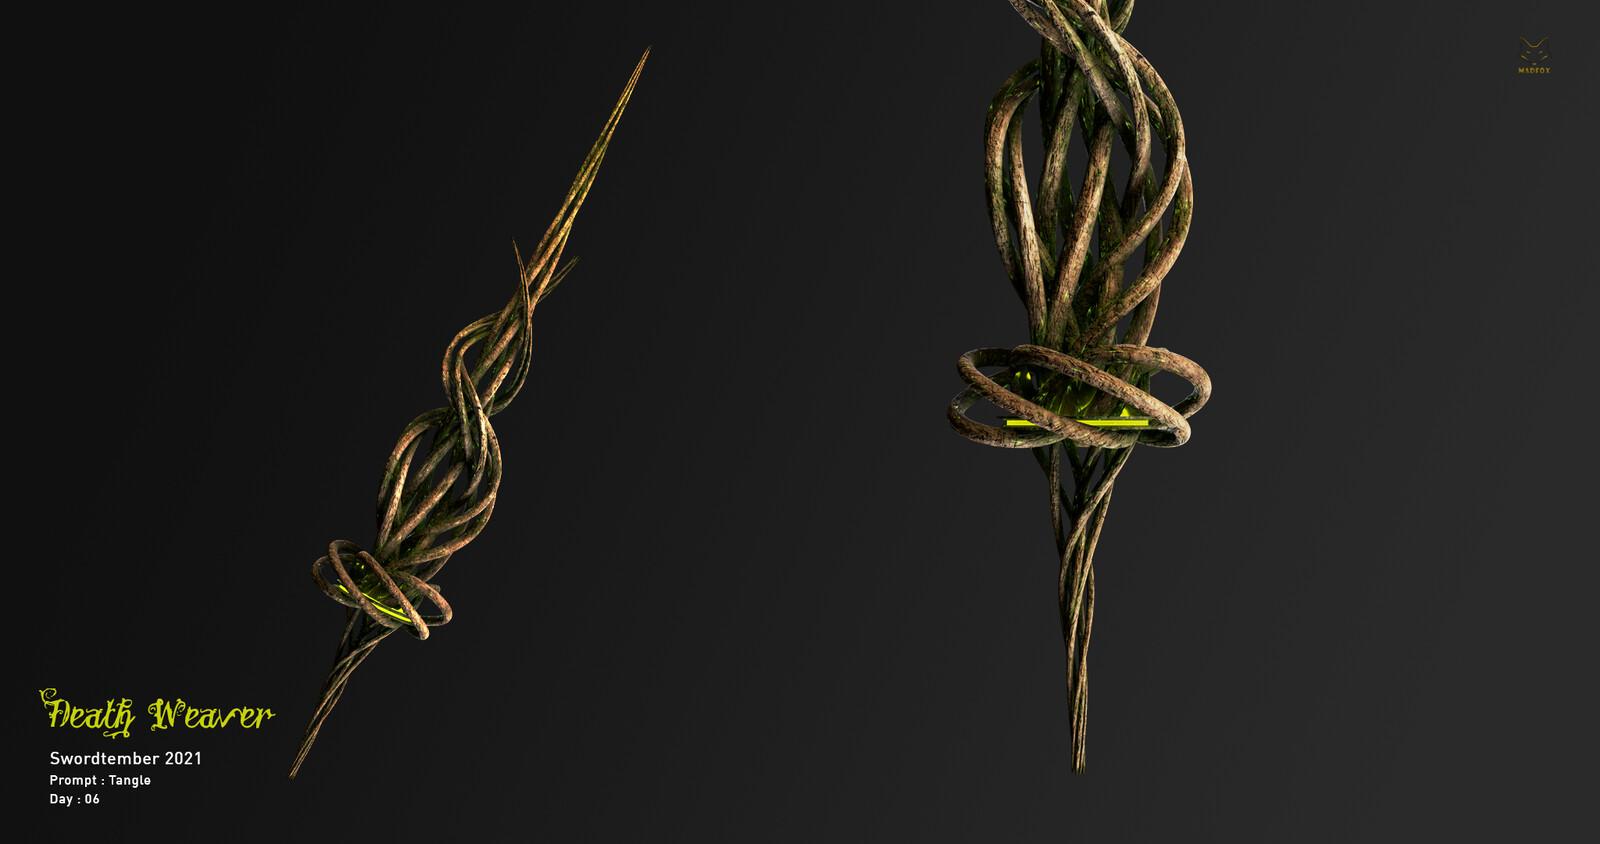 Death Weaver